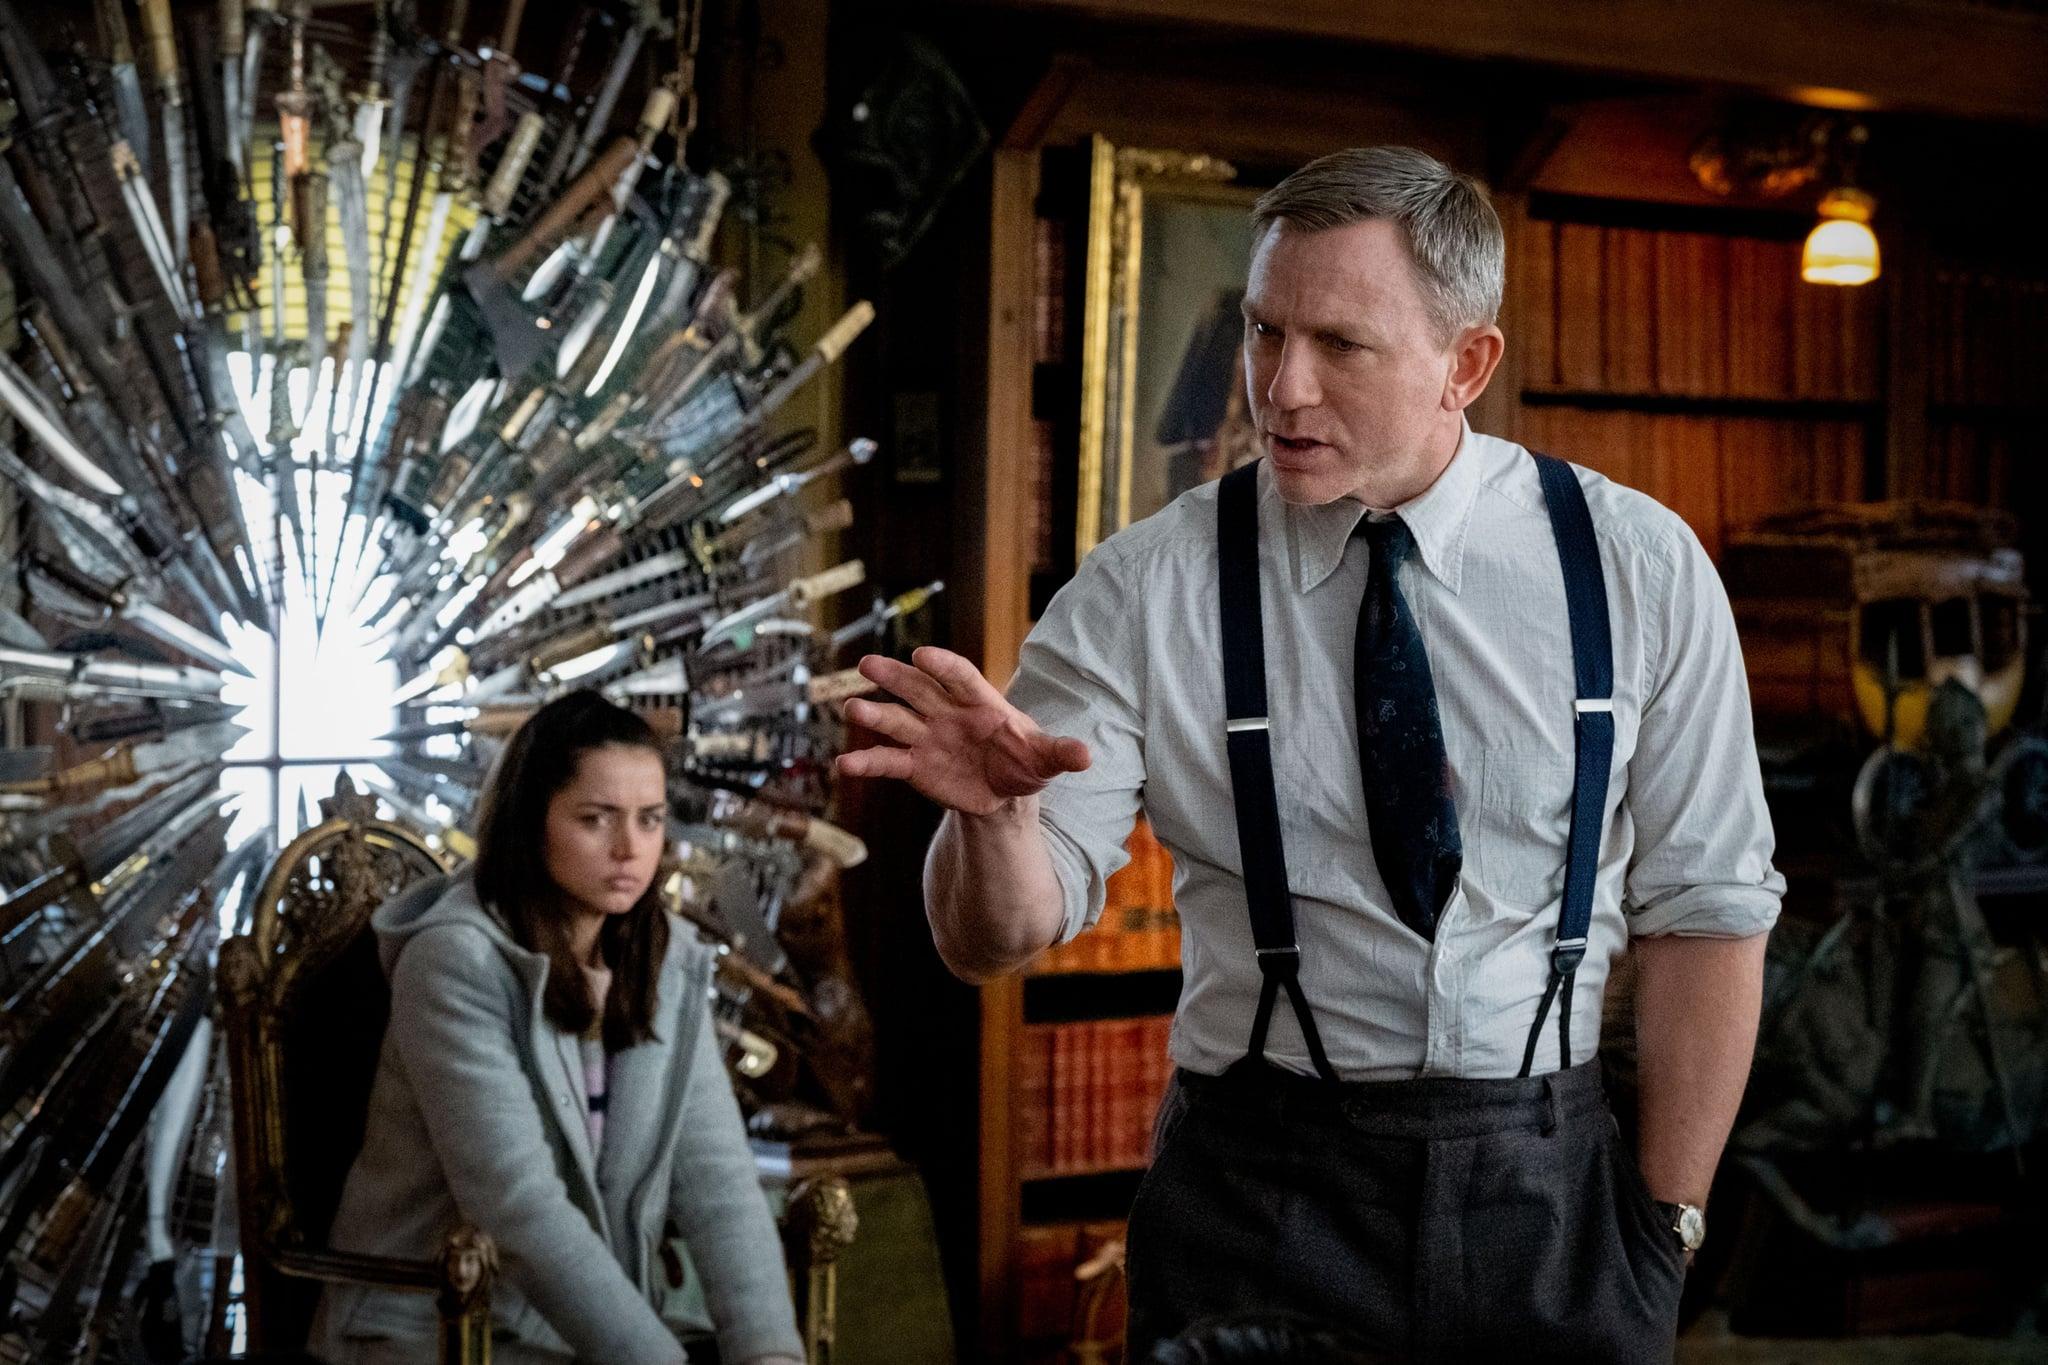 KNIVES OUT, from left: Ana de Armas, Daniel Craig, 2019. ph: Claire Folger / Lionsgate / courtesy Everett Collection